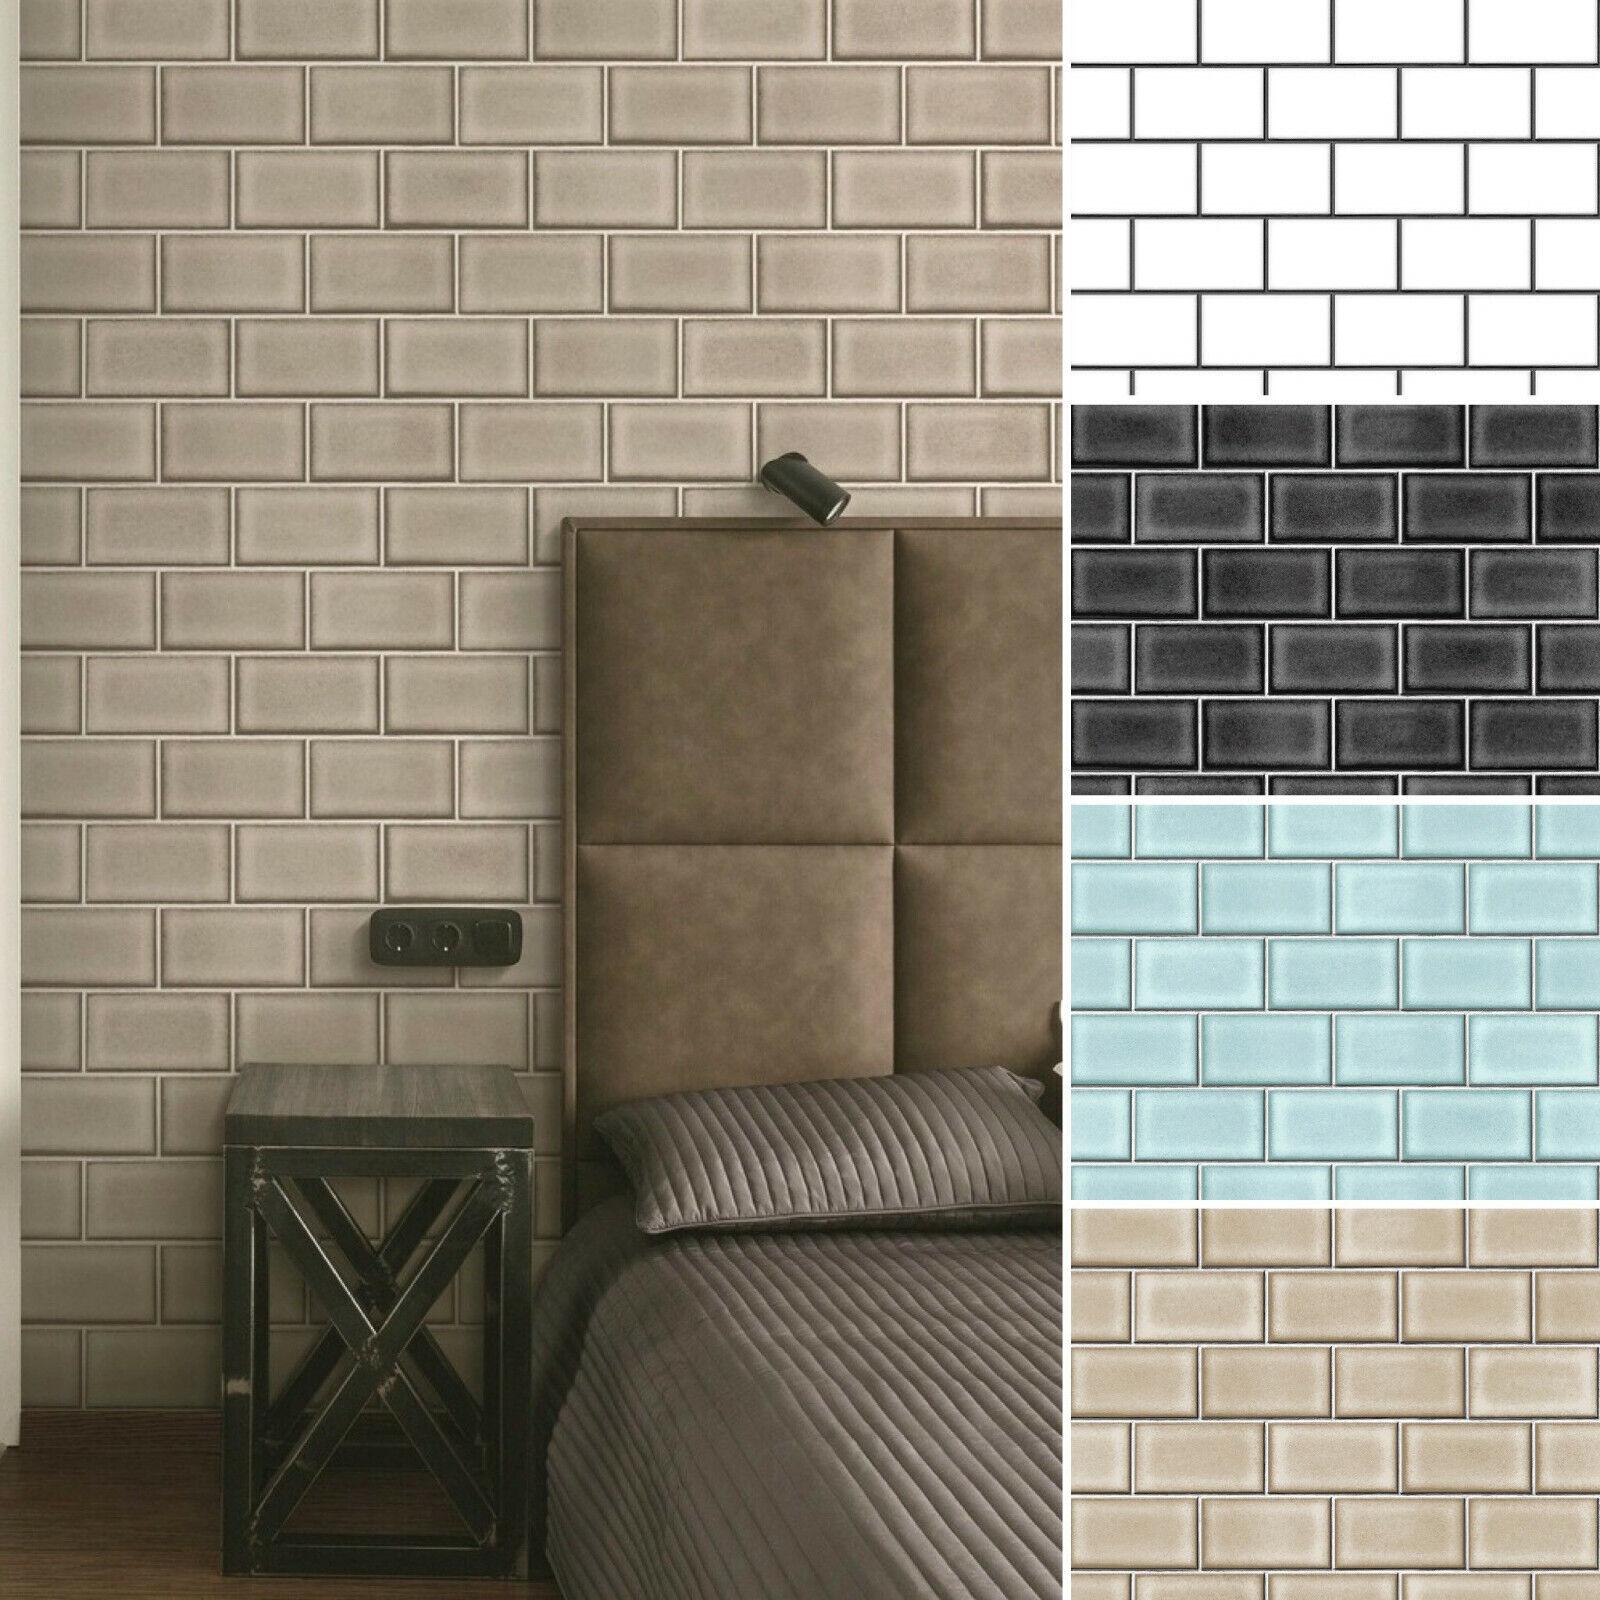 Details zu Vlies Tapete Backstein Ziegelstein Fliesen Muster Mauerziegel  Brick Tile